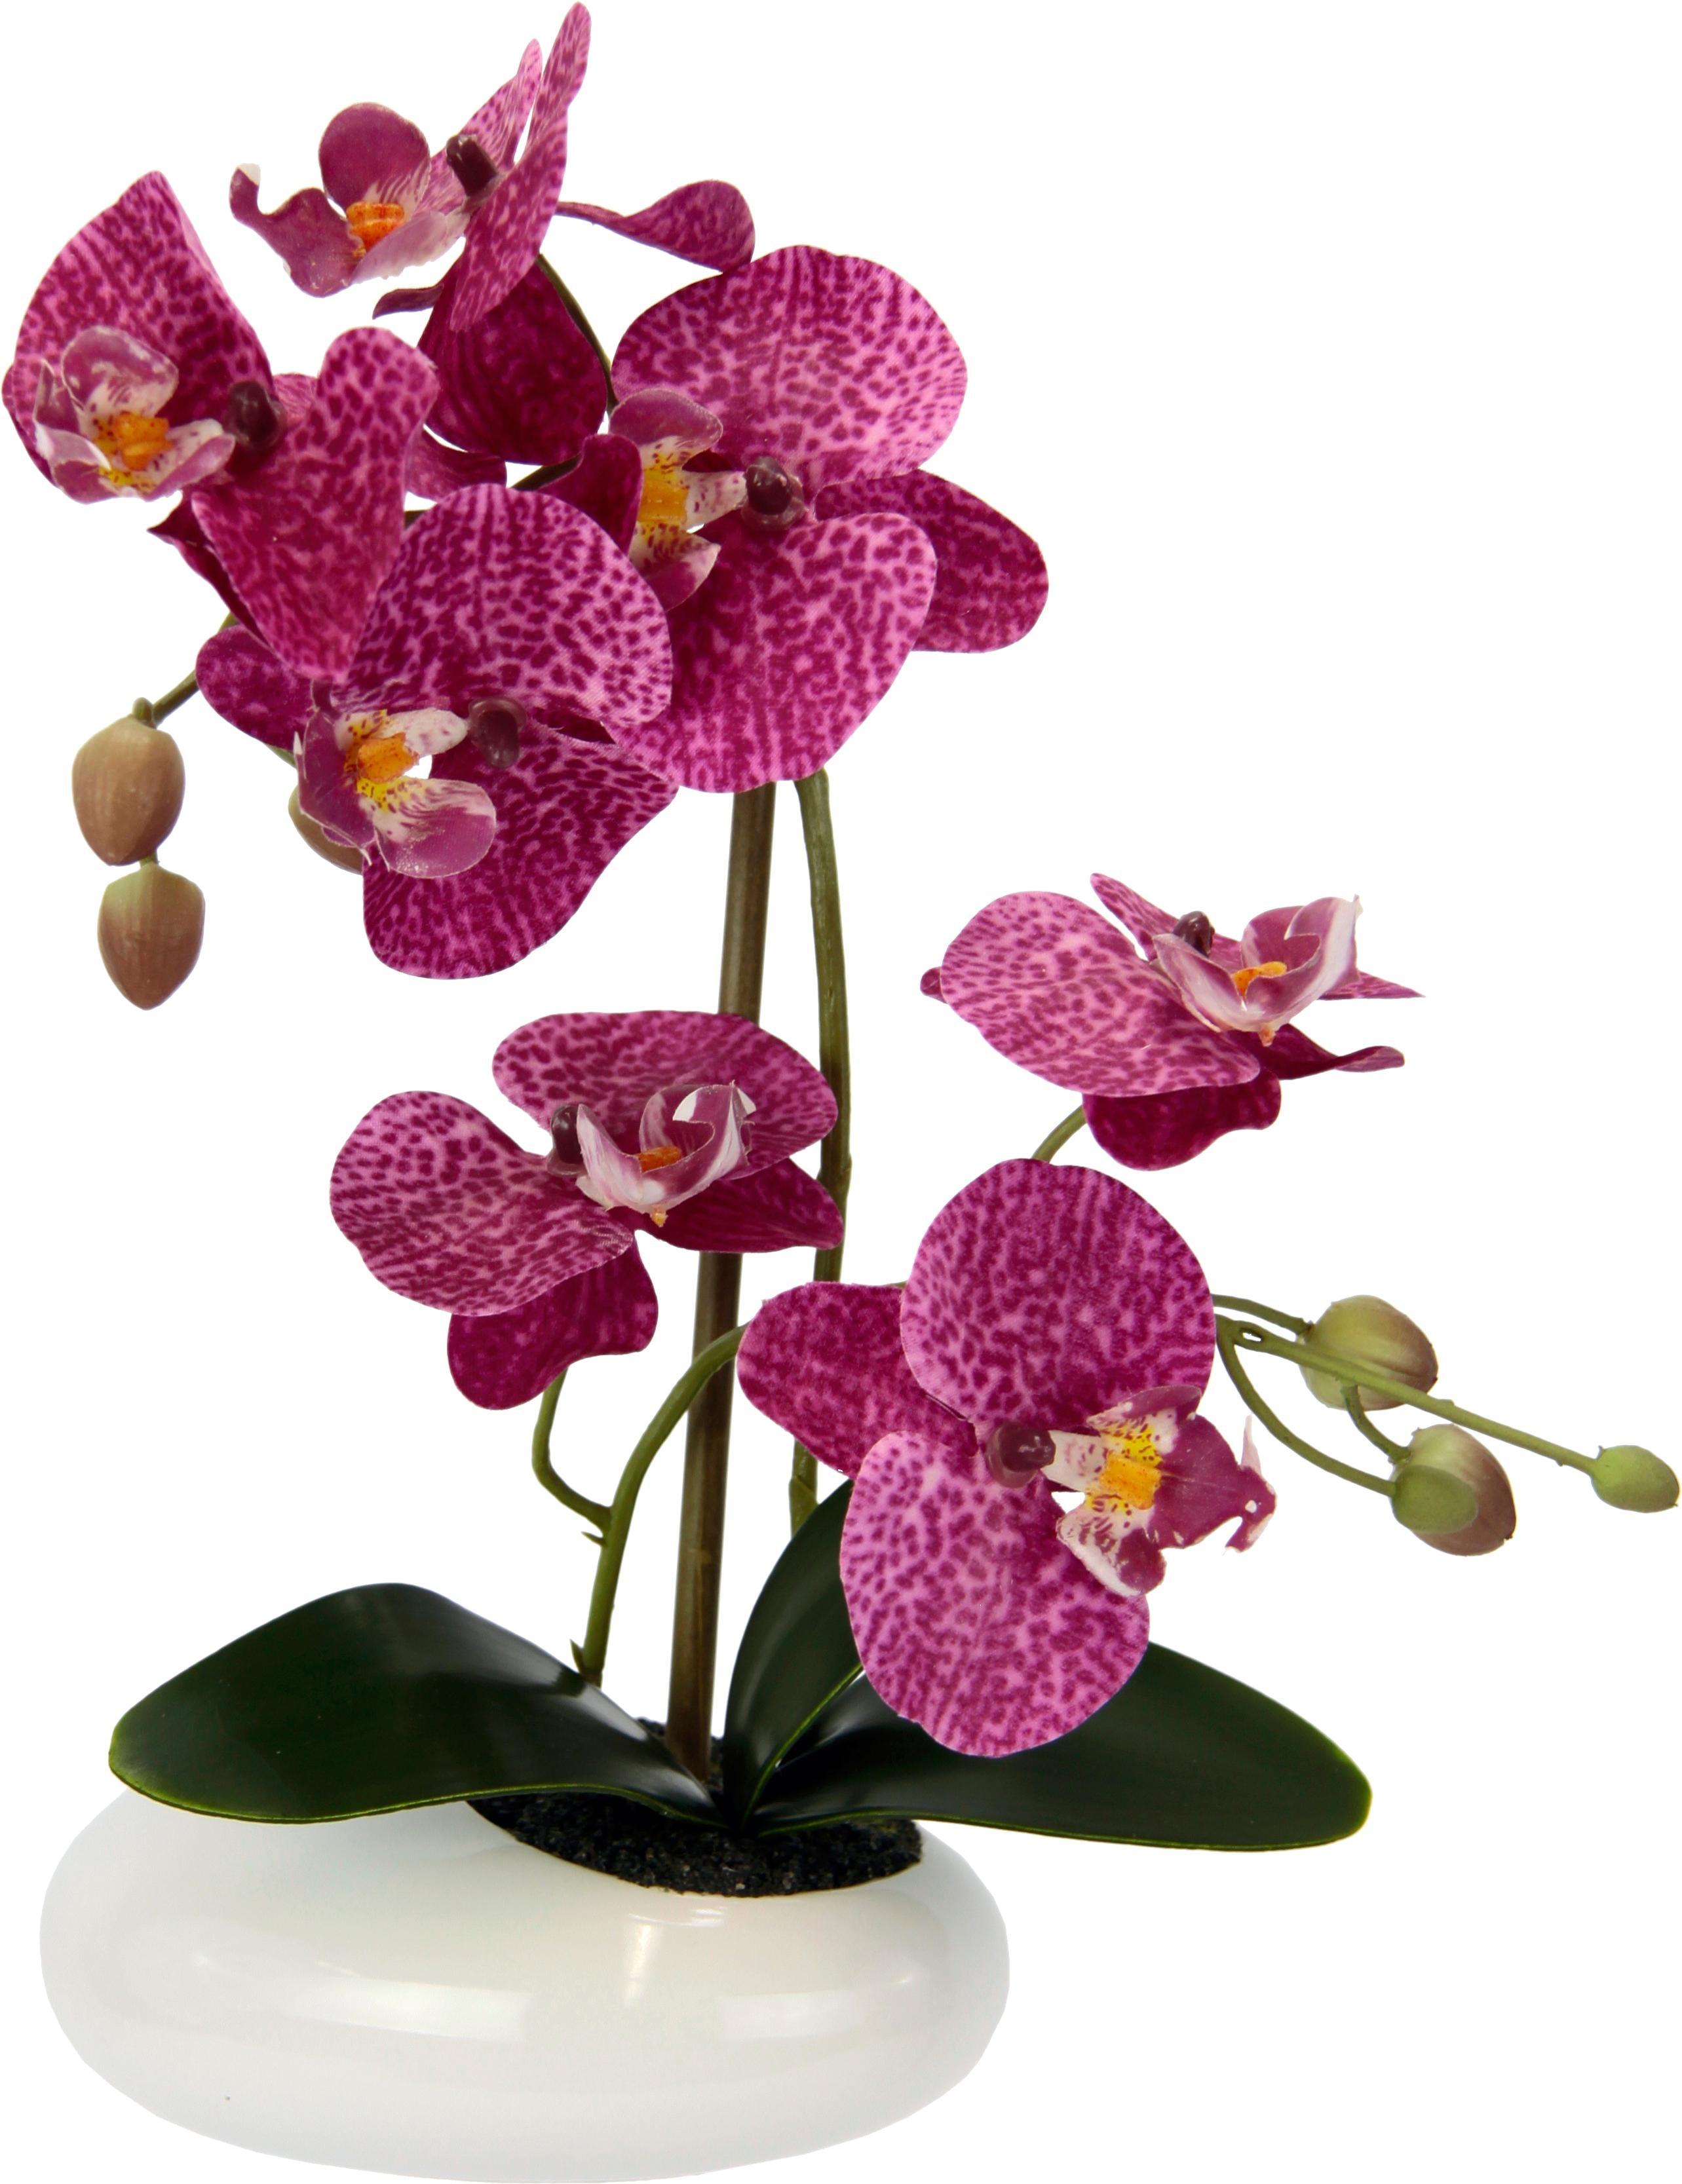 Kunstorchidee Phalaenopsis in Schale   Dekoration > Dekopflanzen > Kunstpflanzen   Rosa